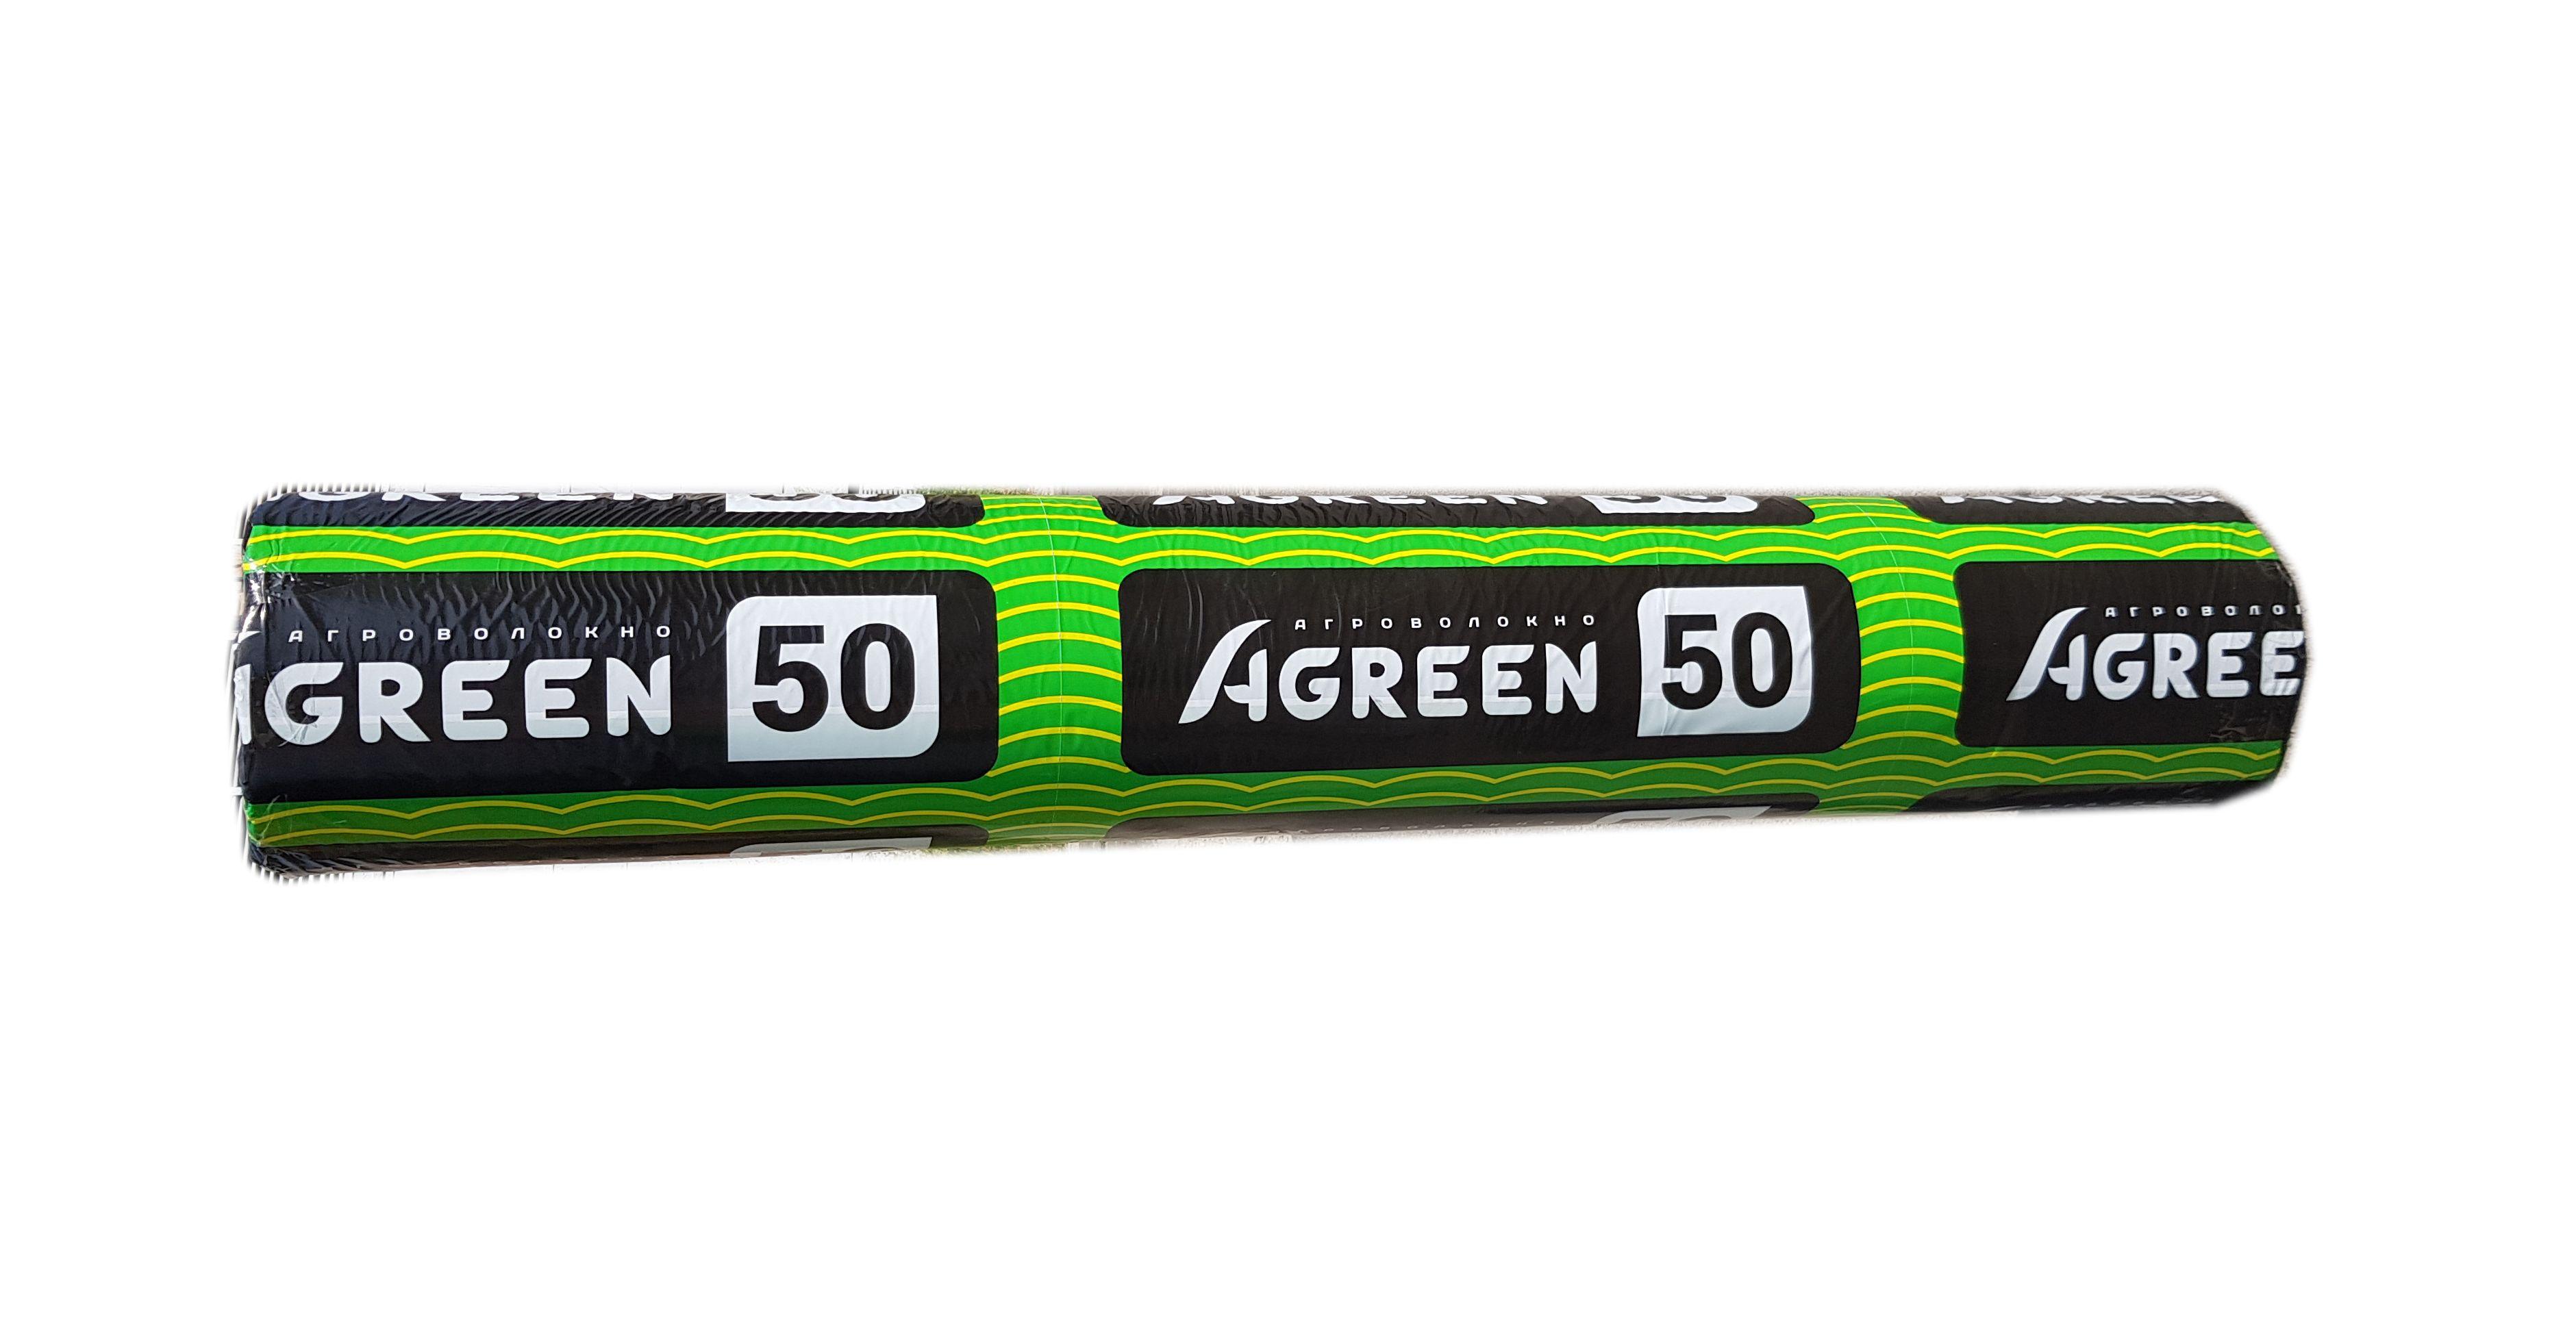 Нова упаковка агроволокна Agreen!